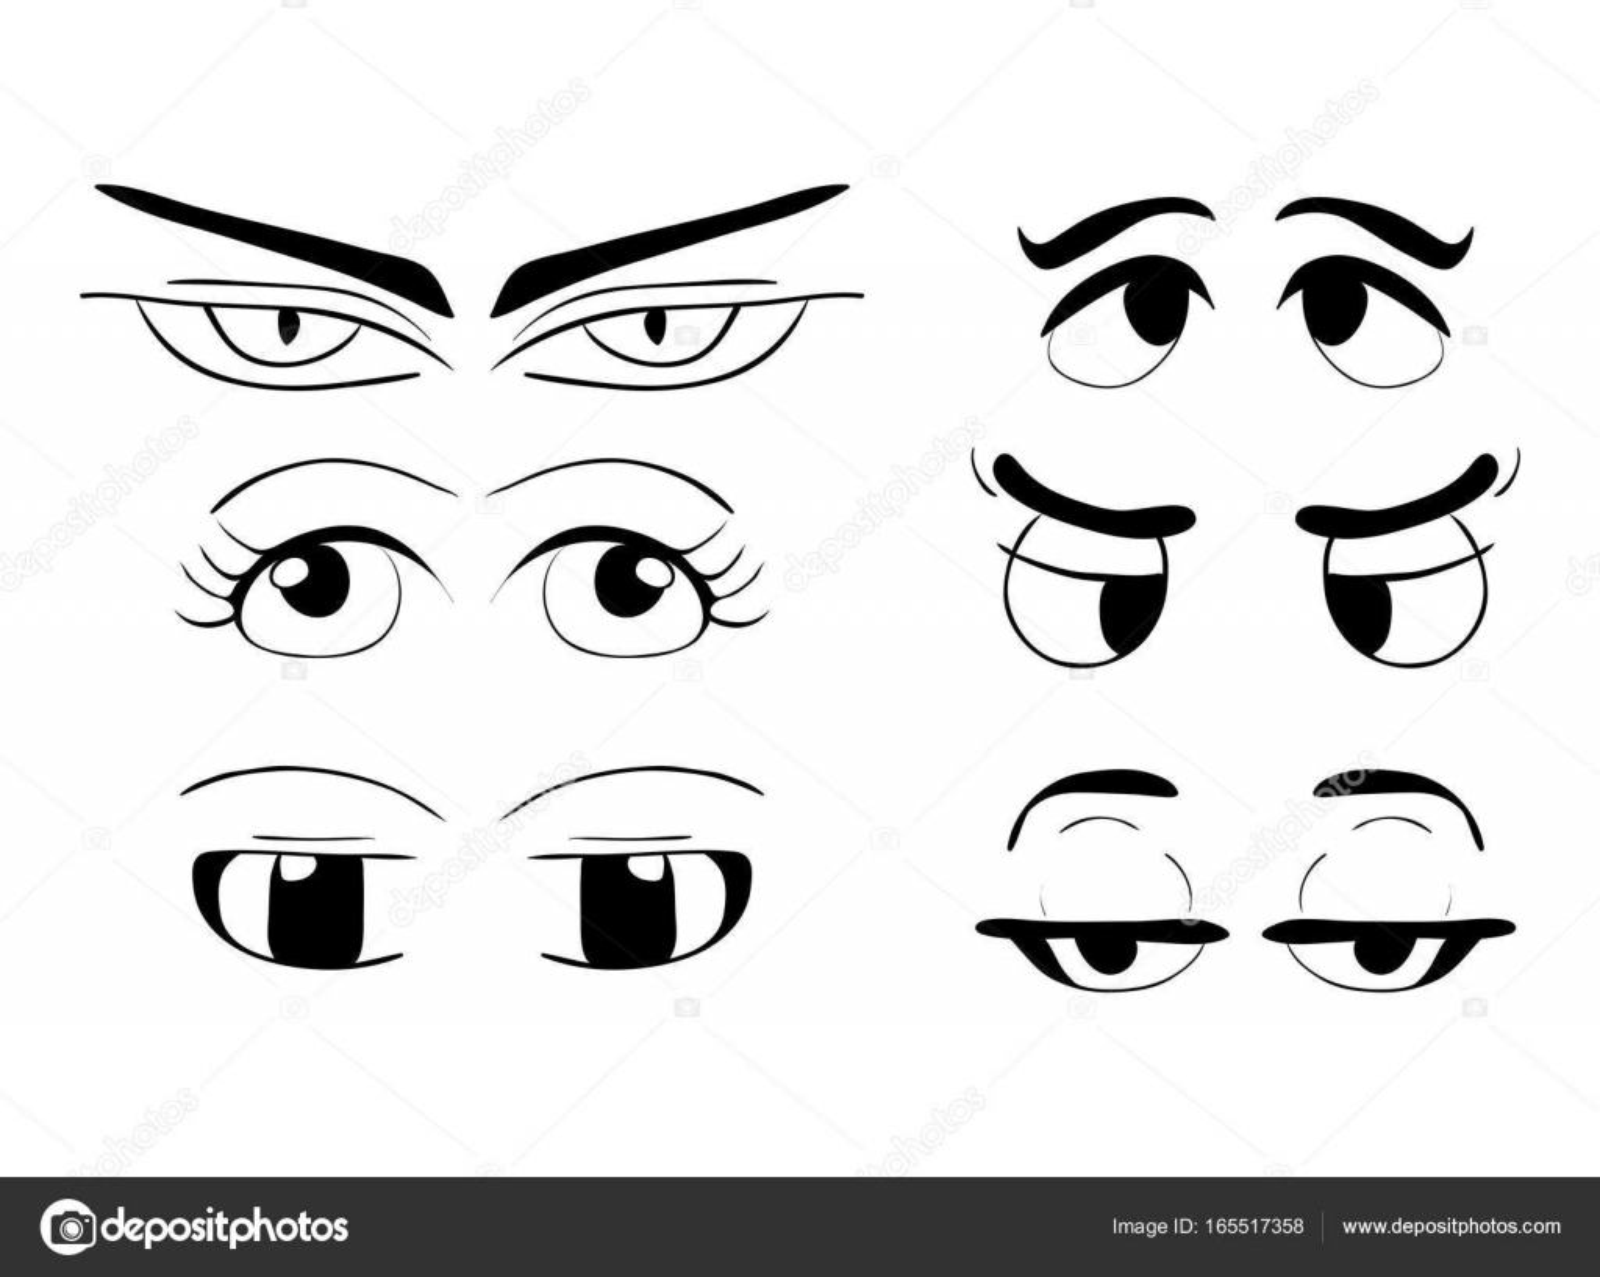 Dibujos Animados Ojos Vector Simbolo Icono Diseno Hermosa